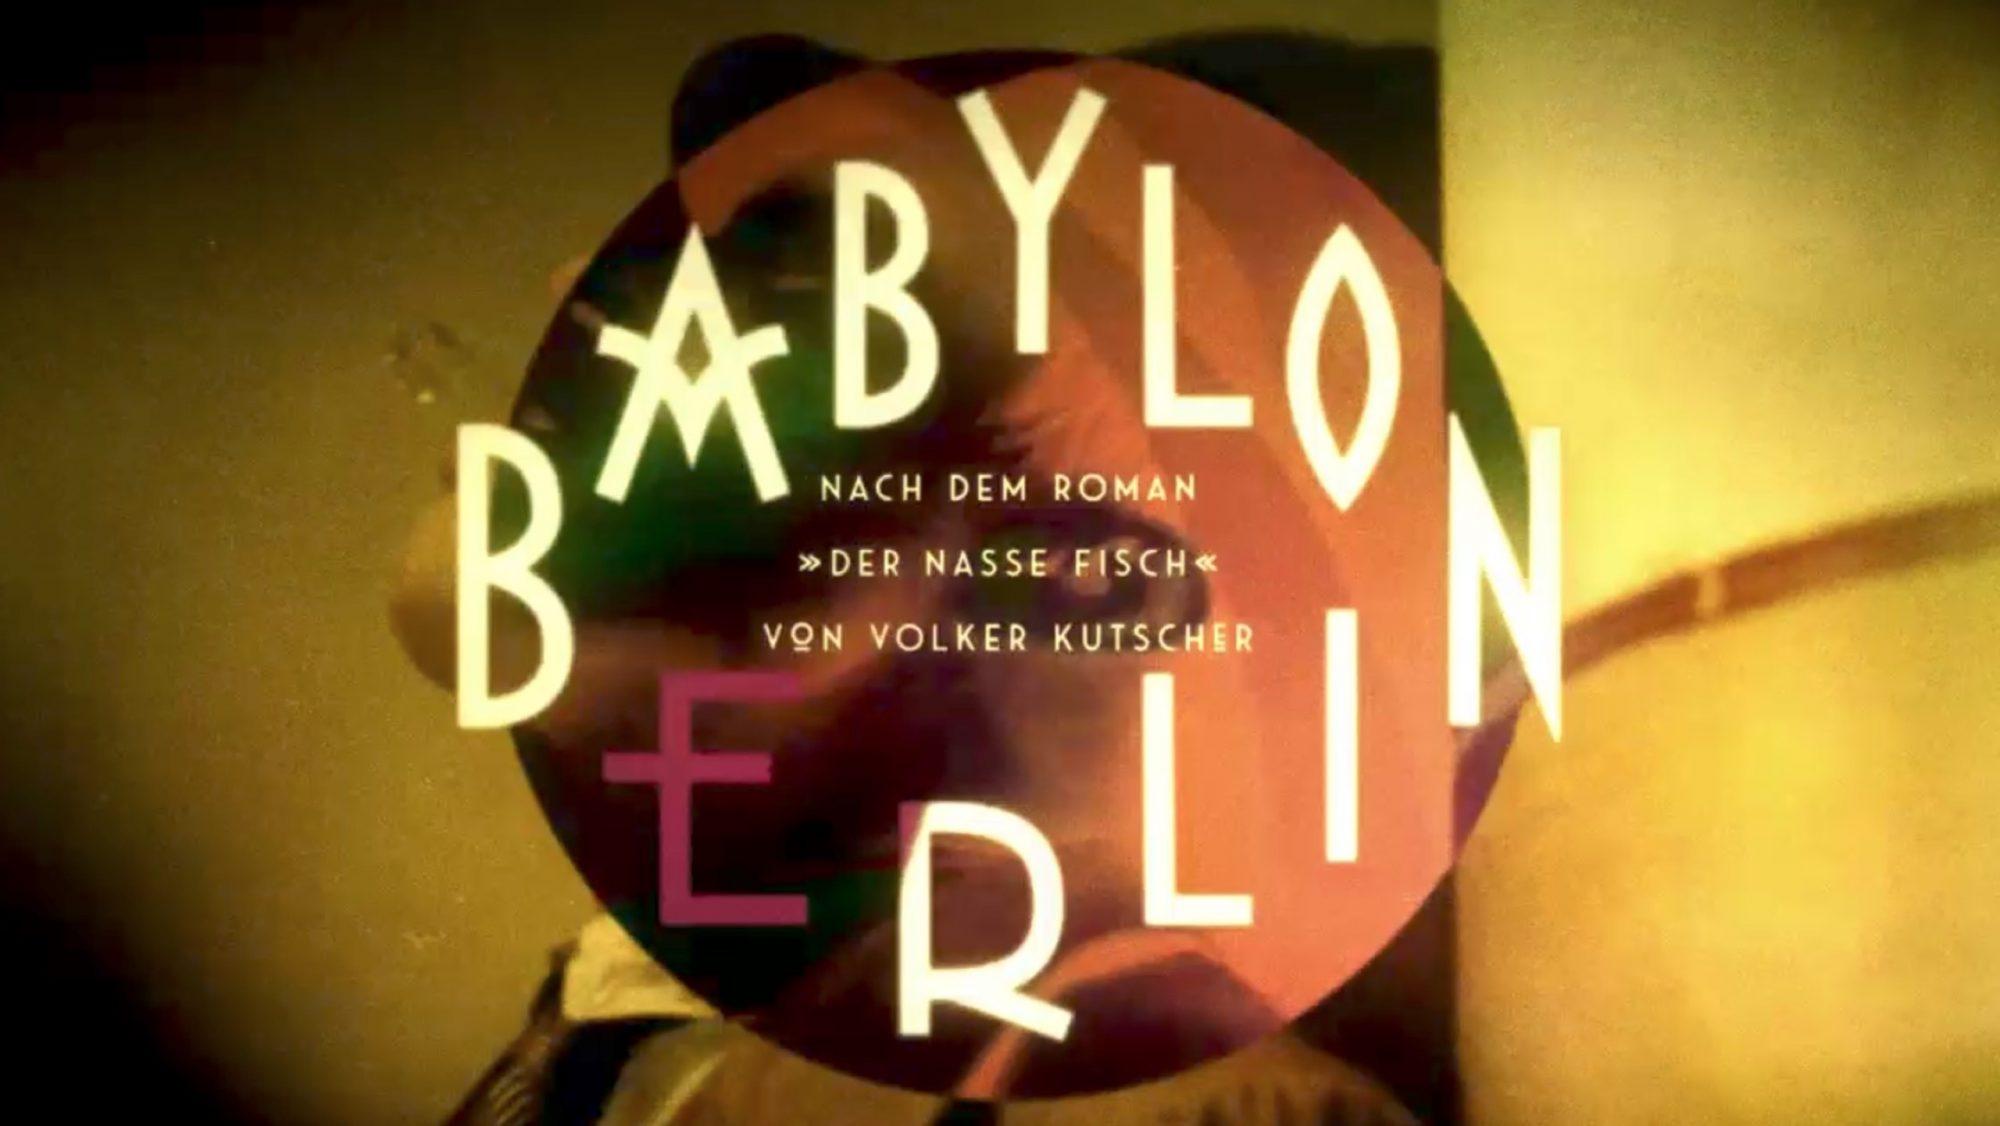 Review: Babylon Berlin – Episode 1 & 2